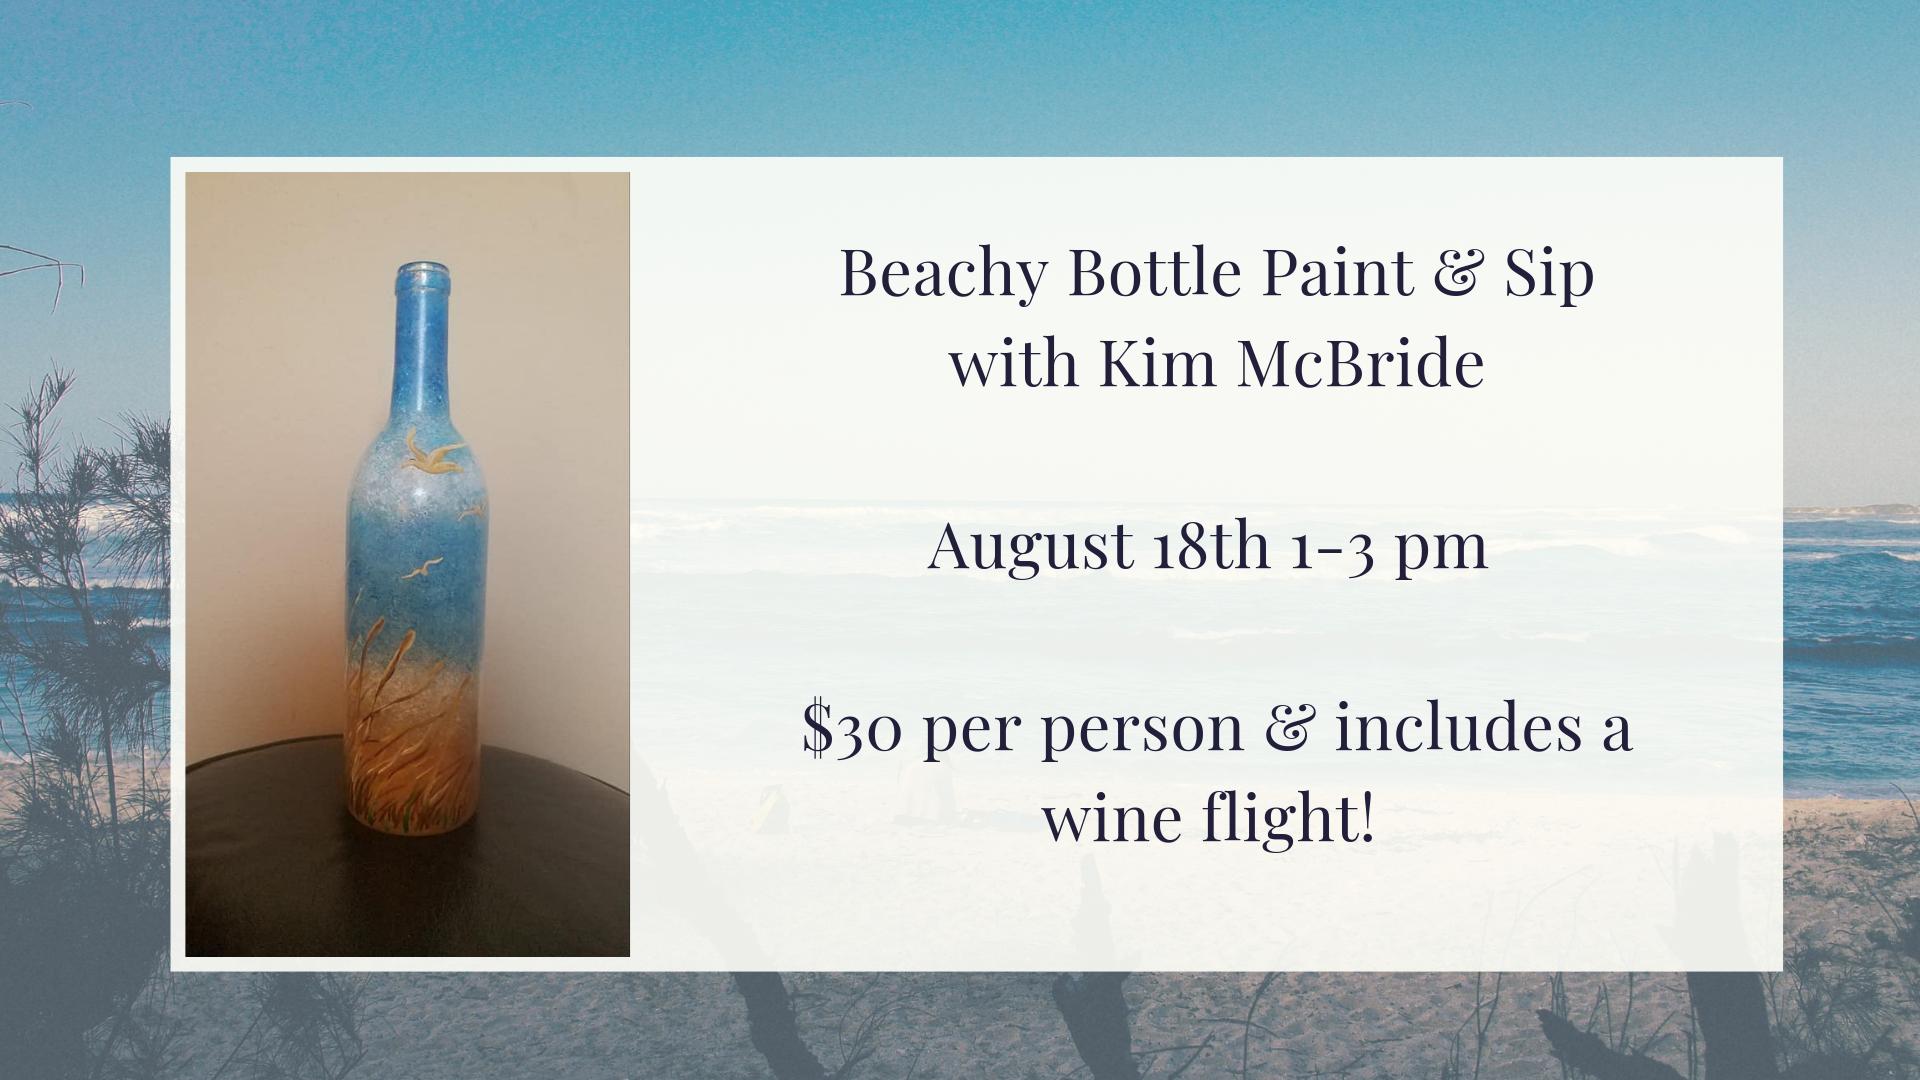 Beachy Bottle Paint & Sip with Kim McBride